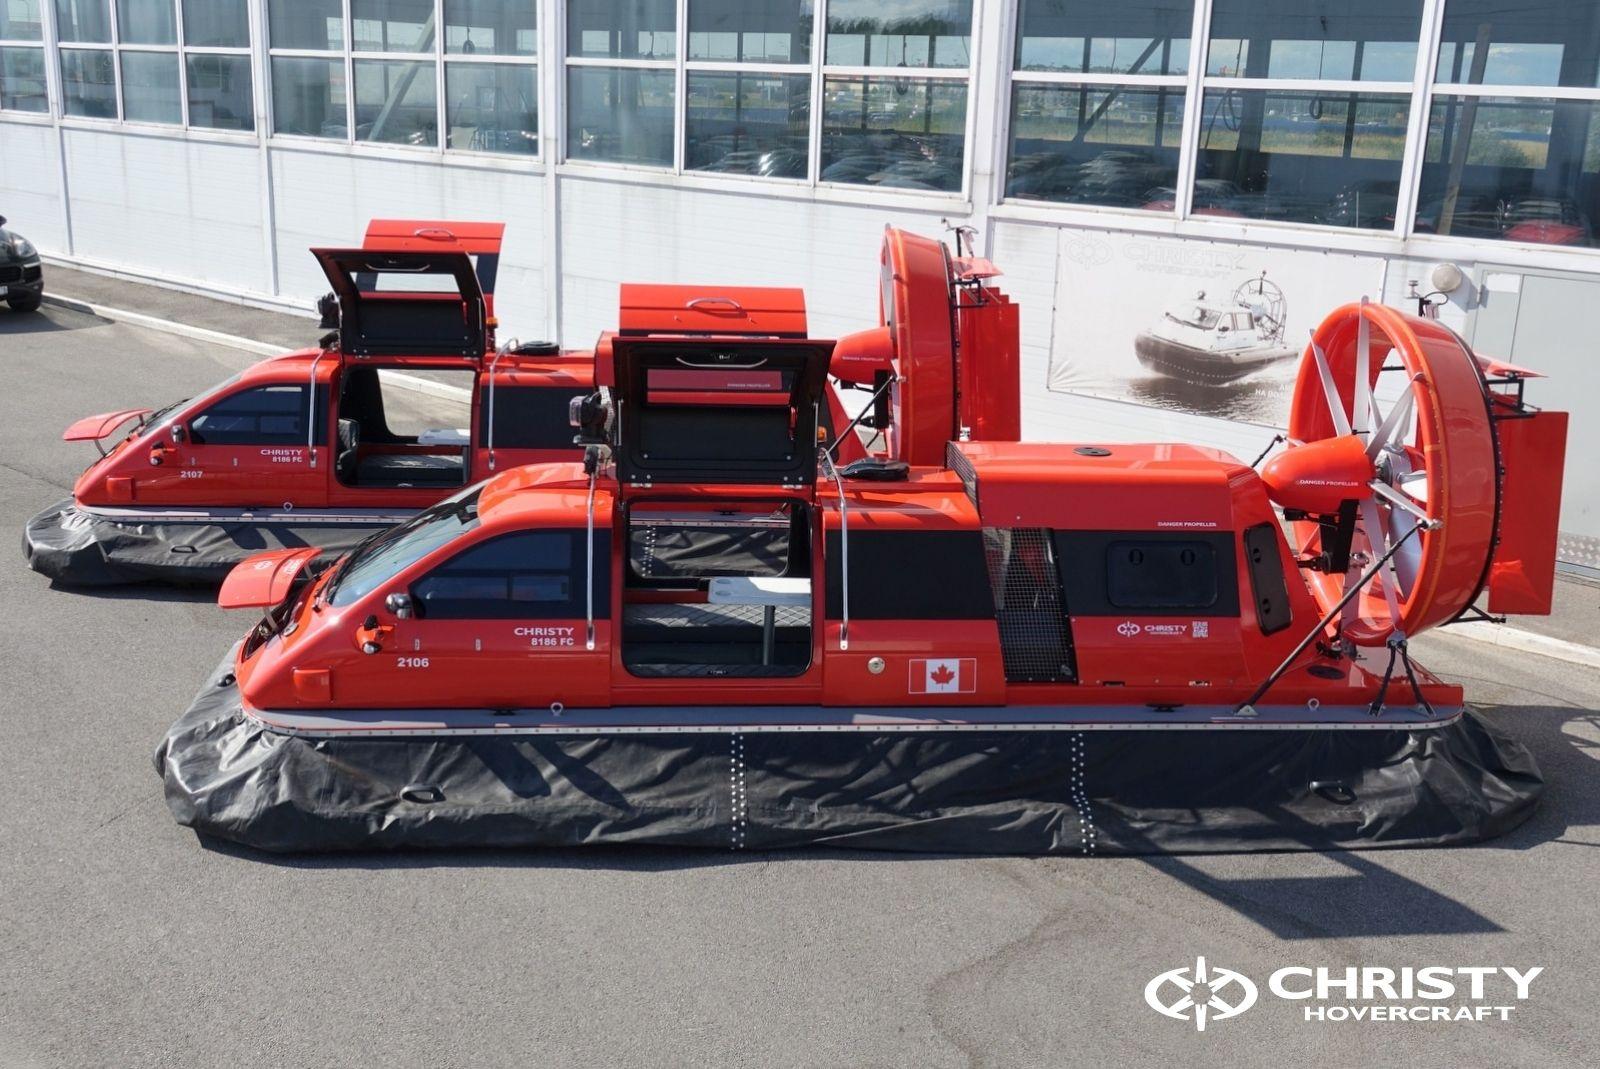 Тест-драйв катера-амфибии Christy 8186 FC Duct для правительства Канады   фото №7